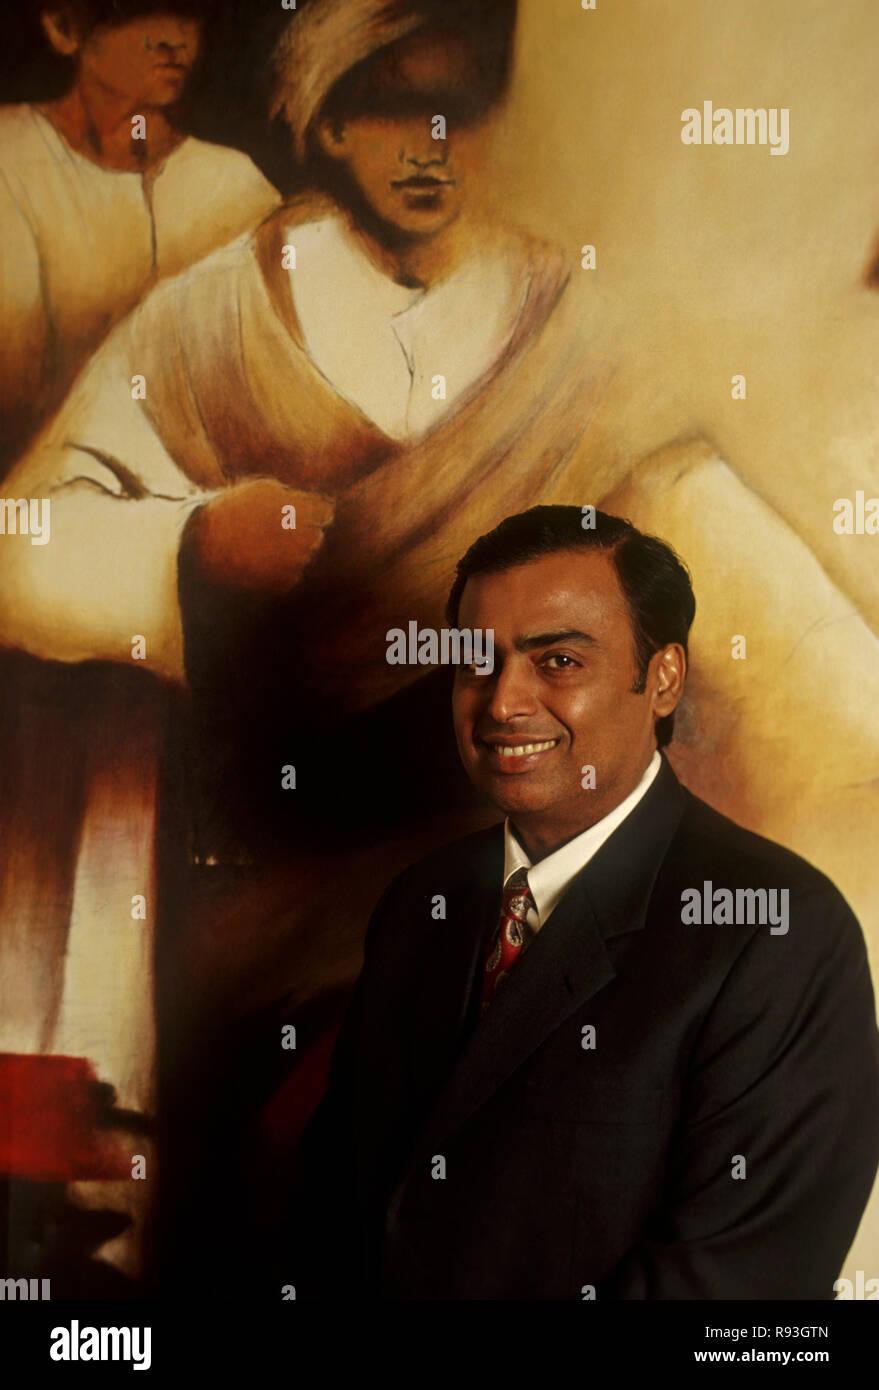 south Asian Indian businessman Mukesh ambani, chairmen of reliance industry, India, NO MR - Stock Image